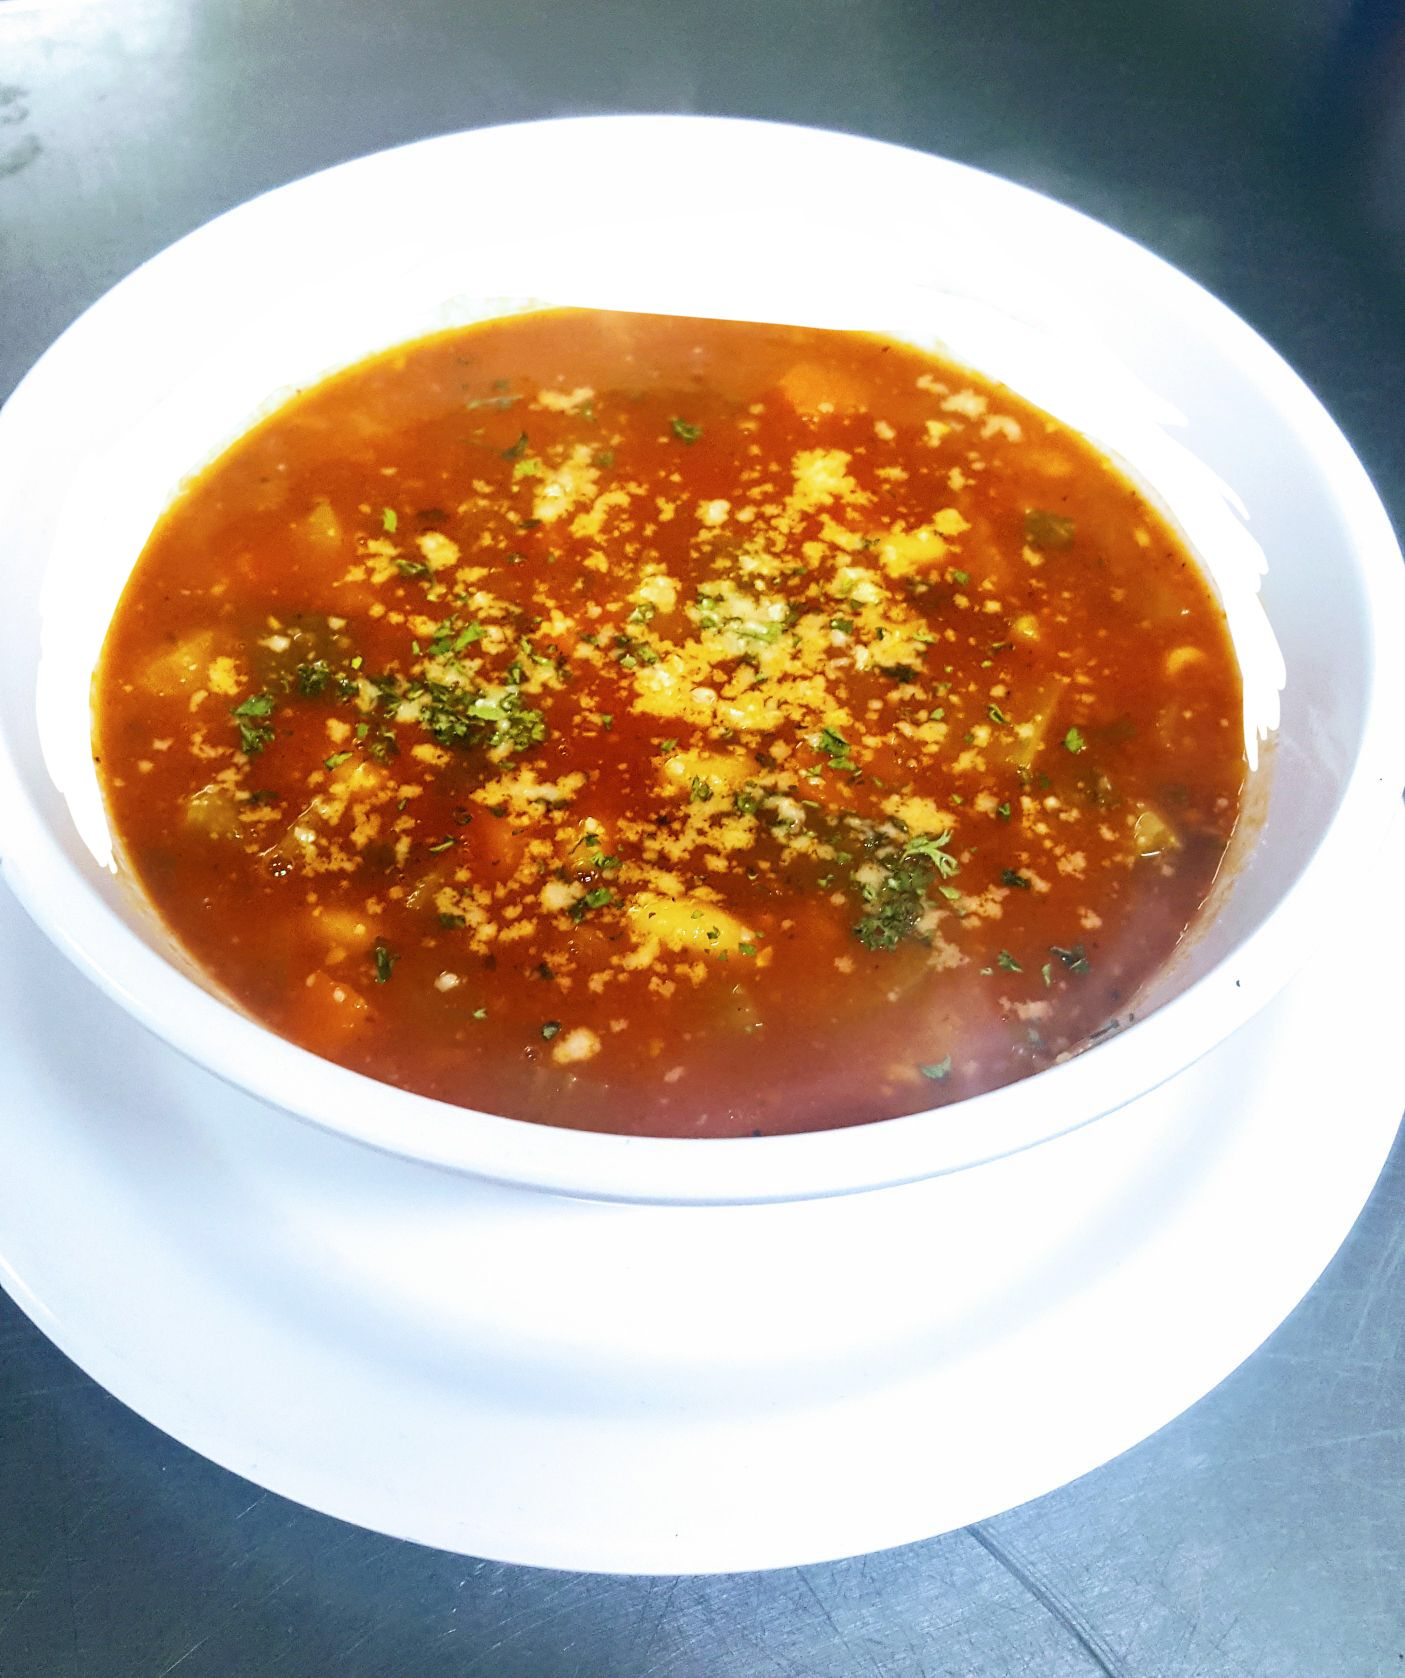 Soup (16oz) Image